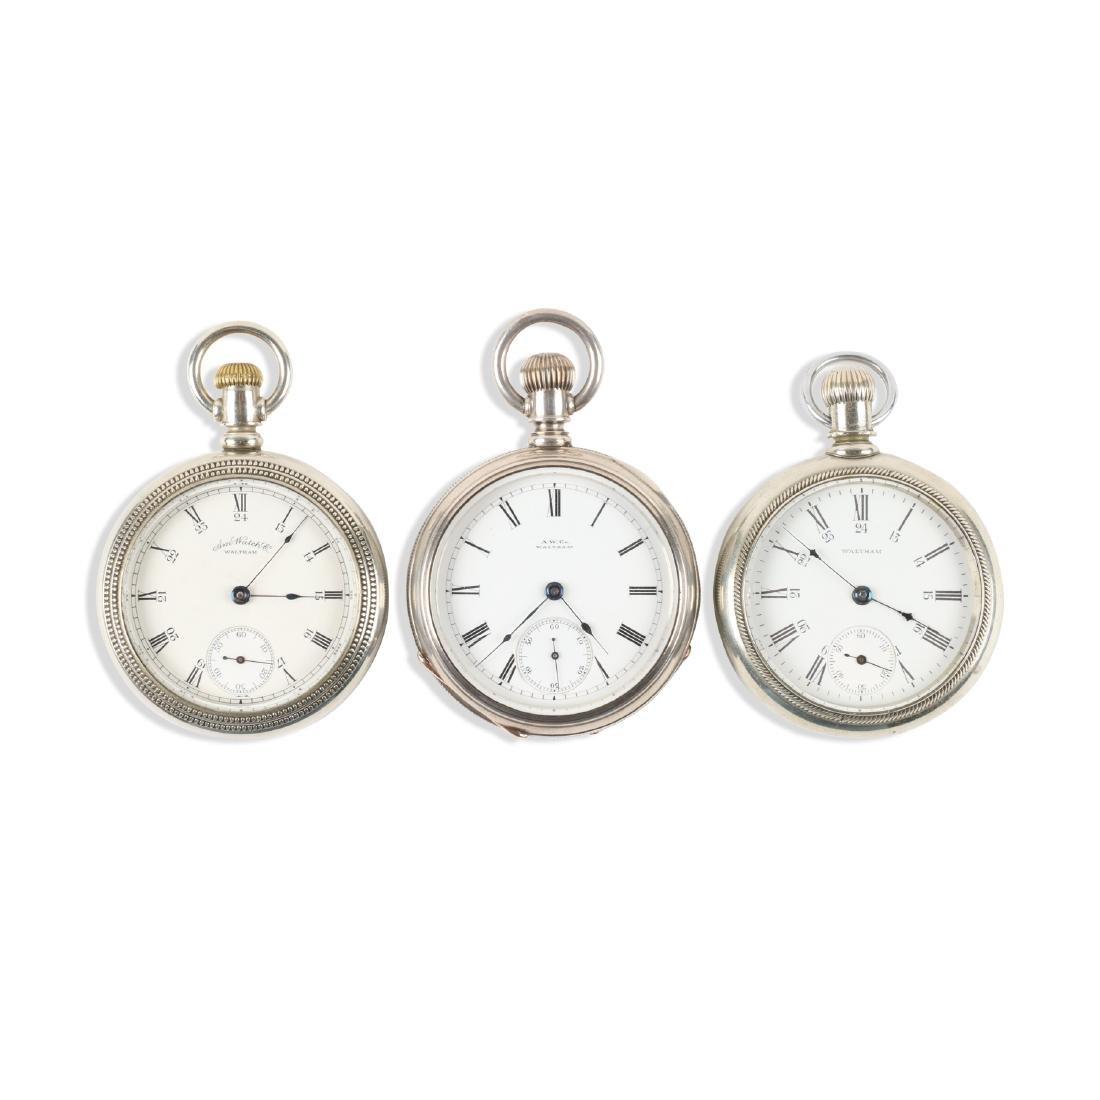 Waltham, Bartlett & Sterling Pocket Watches